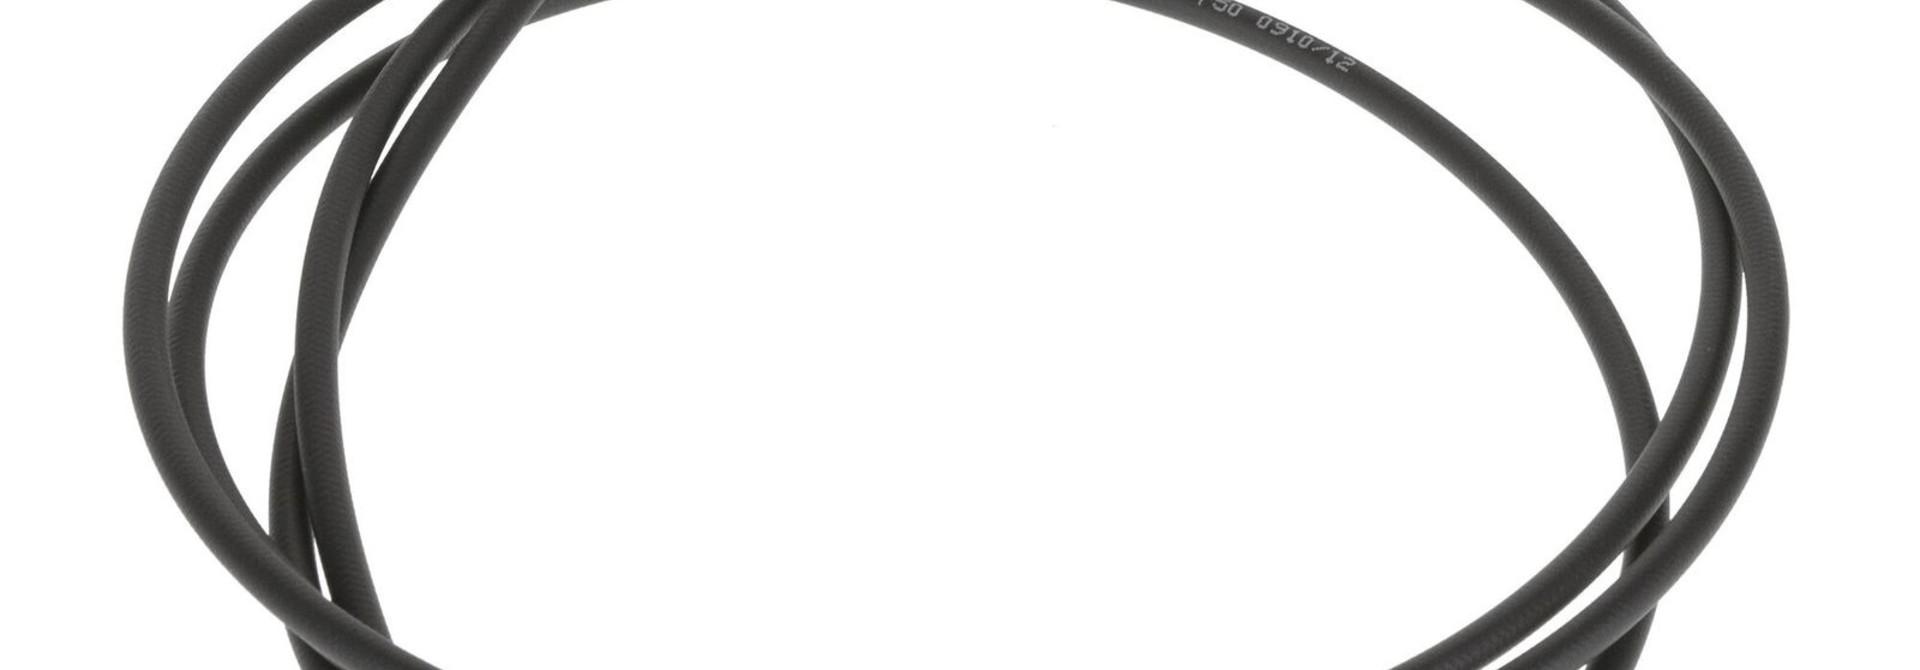 Formula Cura Replacement Hose 200cm Matte Black